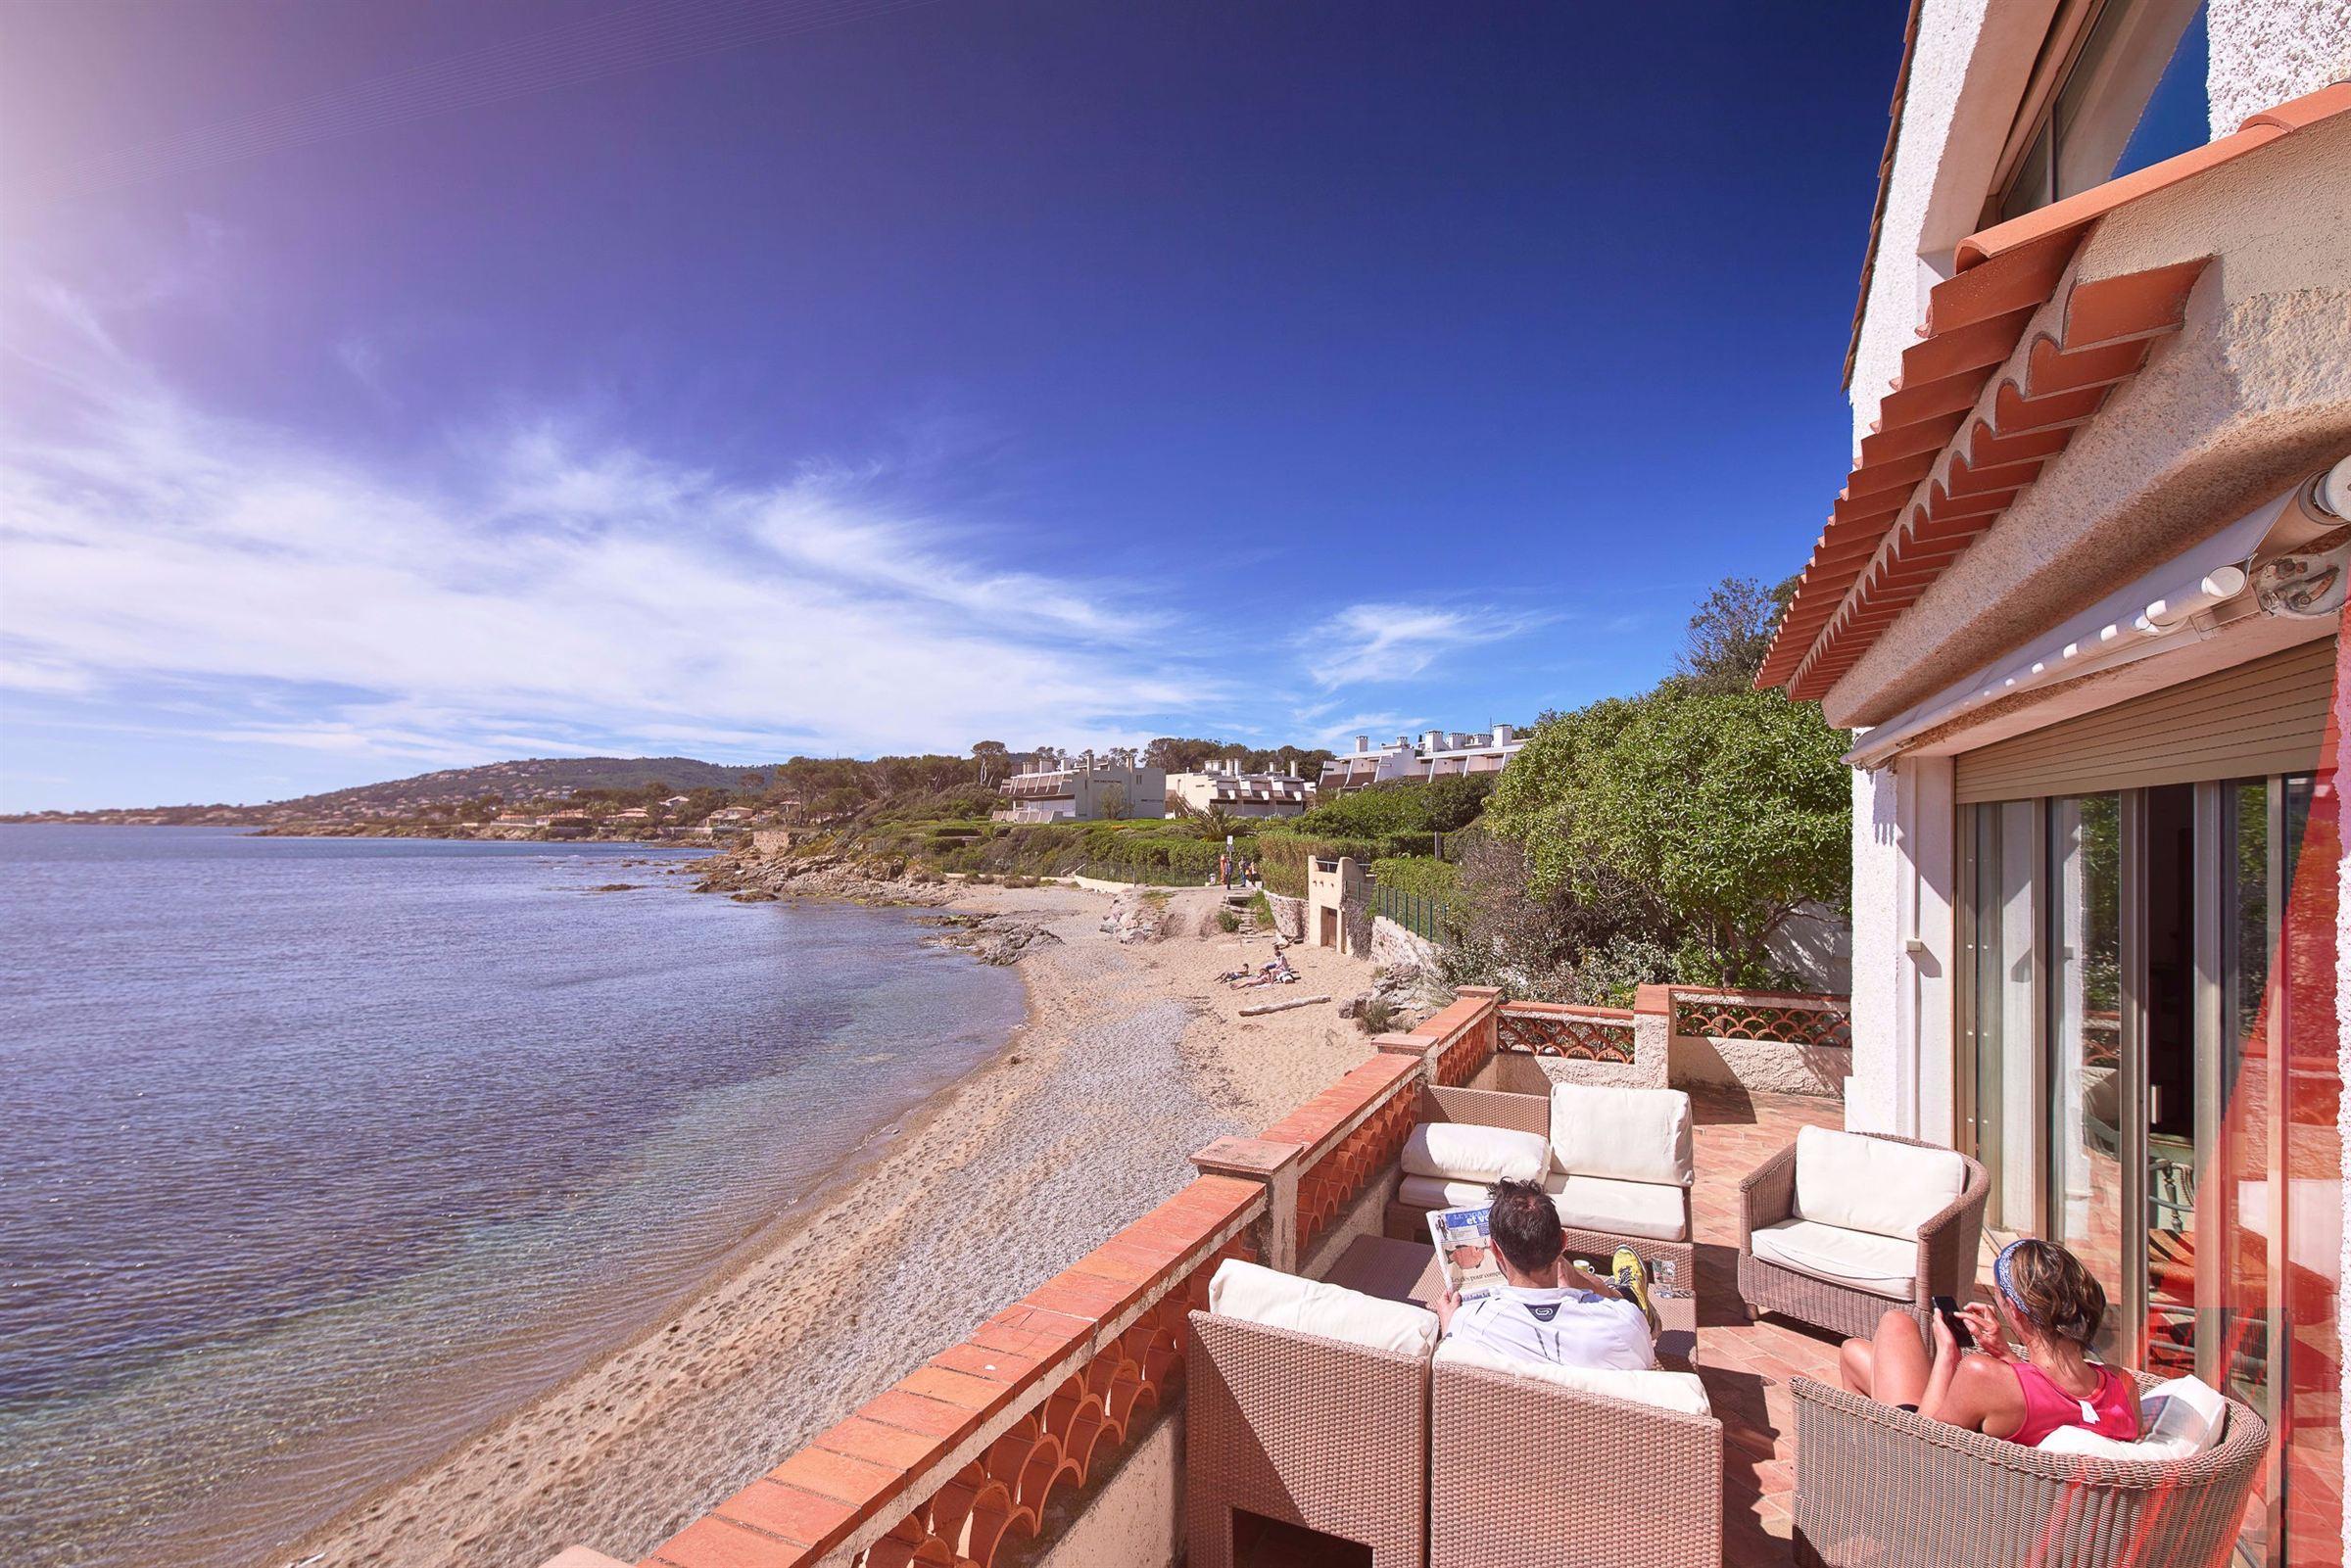 france st aygulf waterfront villa for sale between. Black Bedroom Furniture Sets. Home Design Ideas